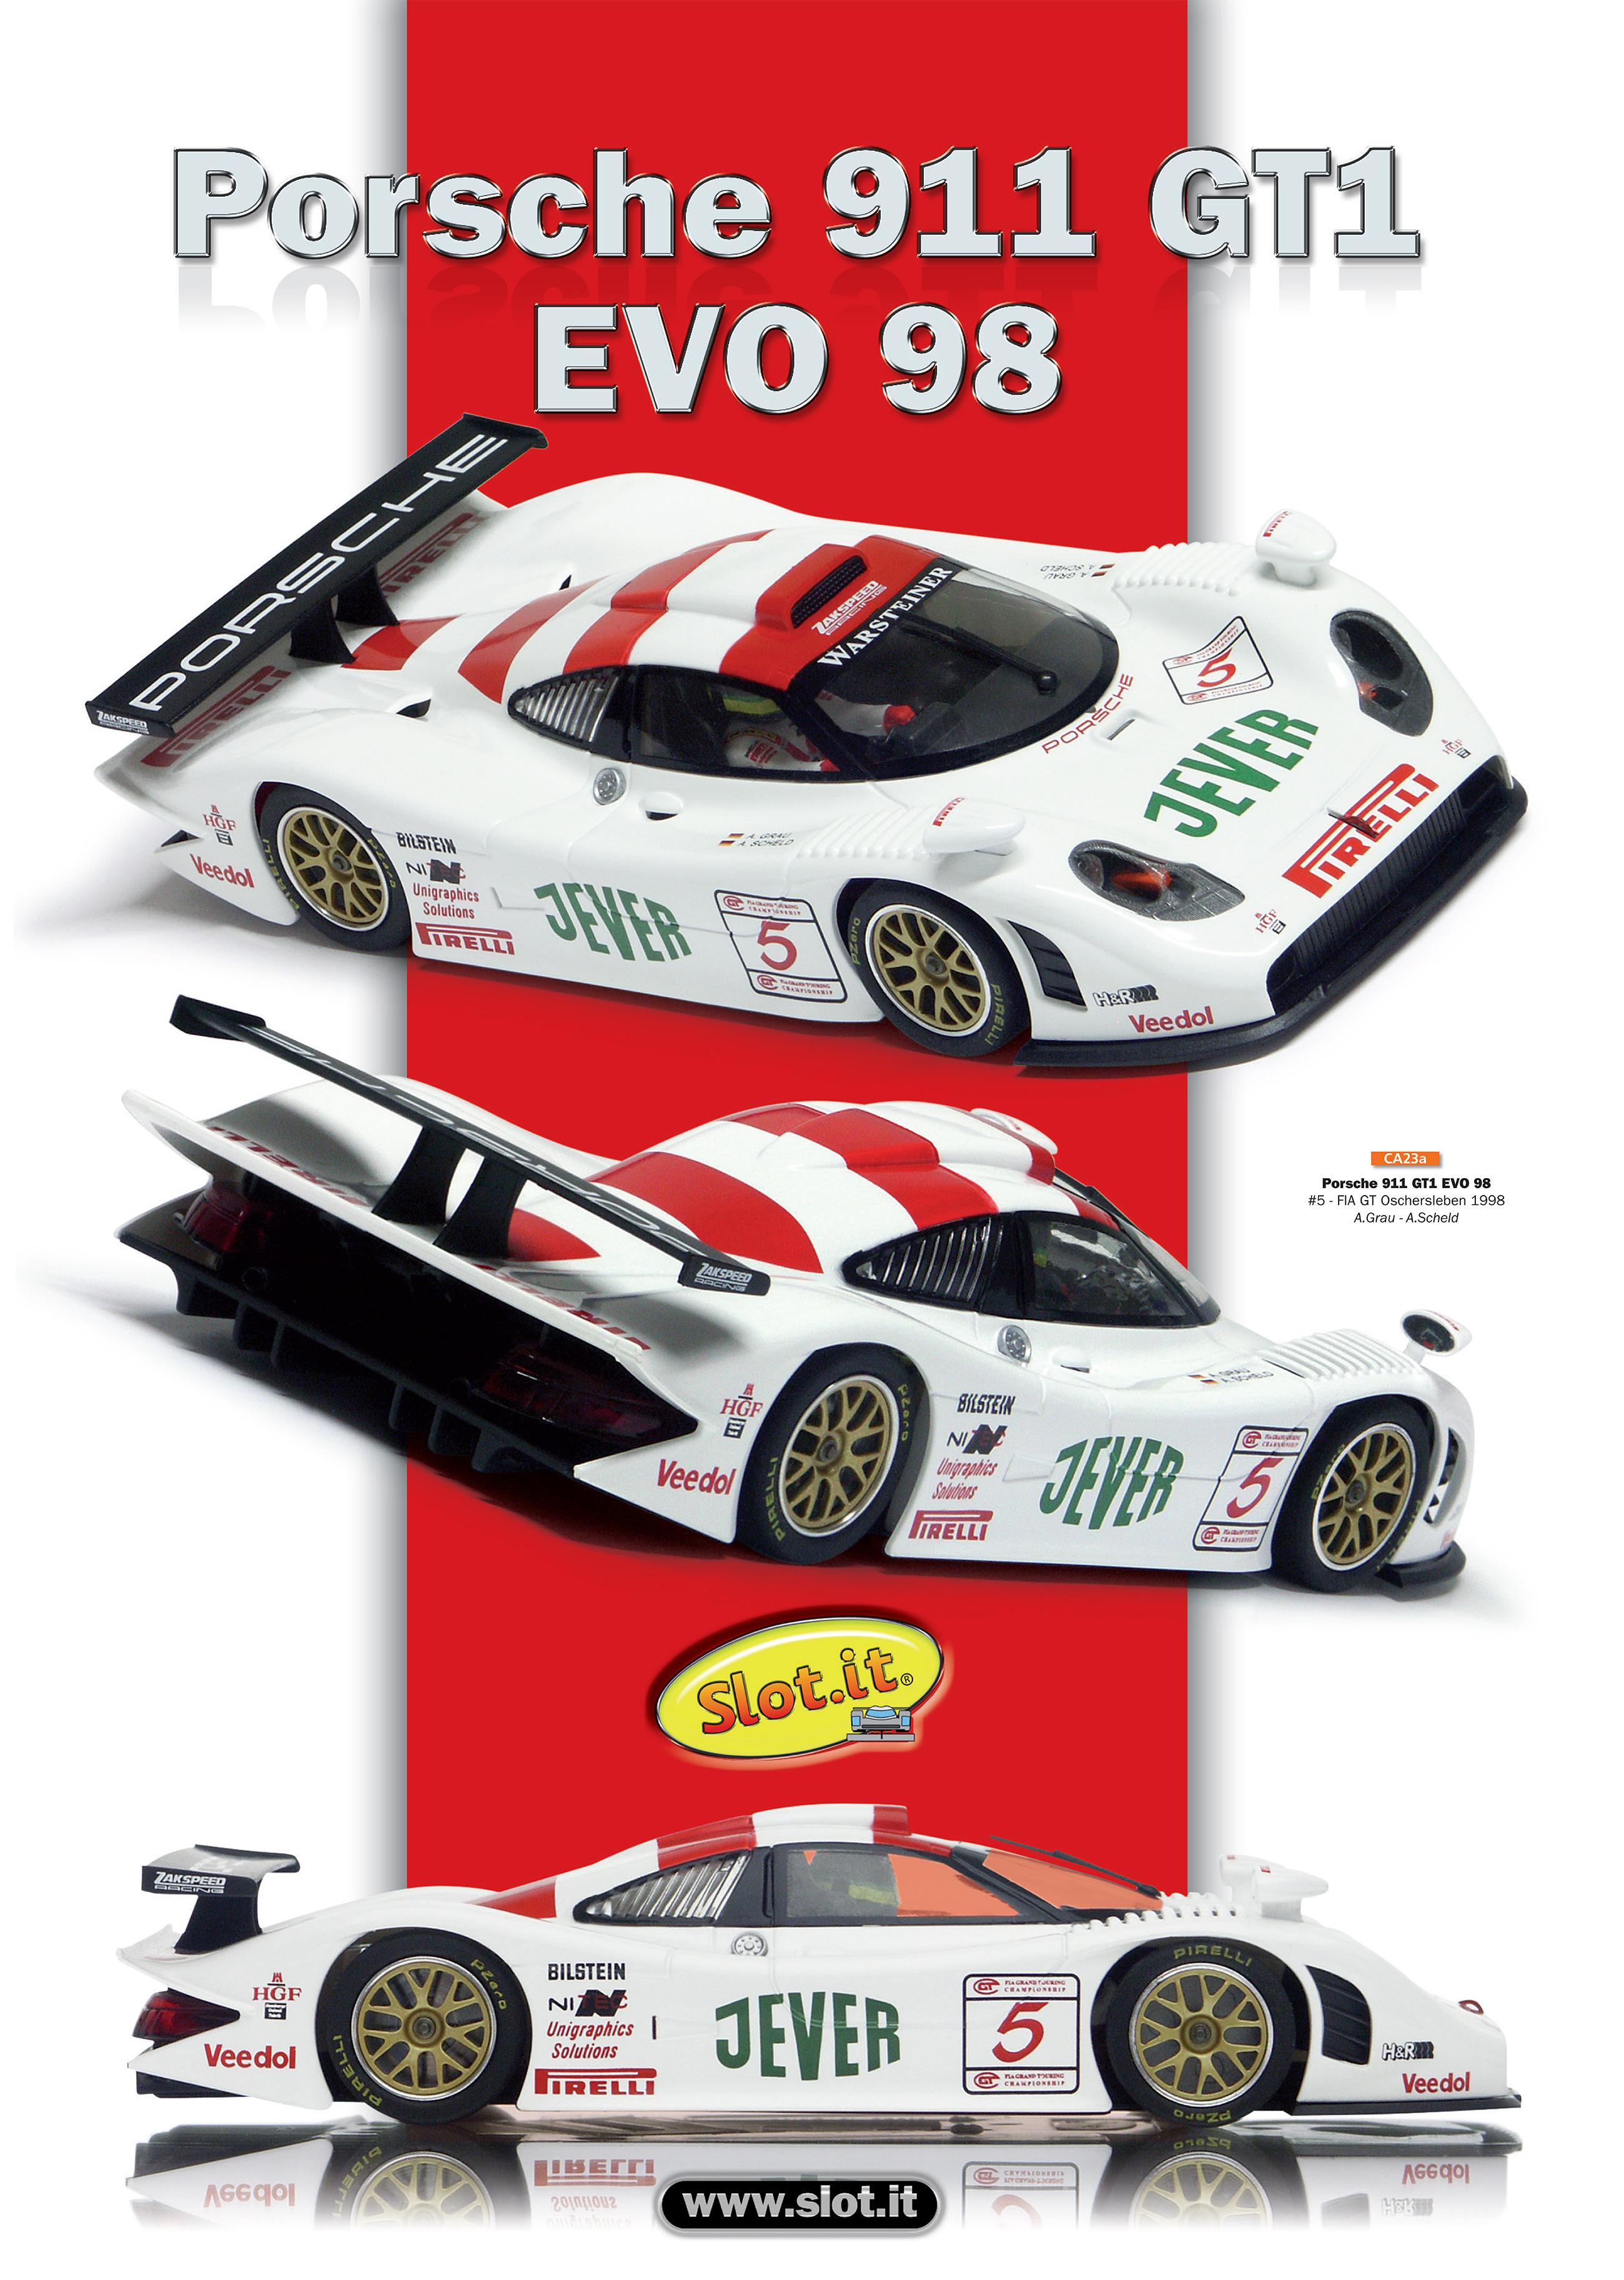 Porsche%20911%20CA23 Fascinating Porsche 911 Gt1 Evo 98 Slot It Cars Trend